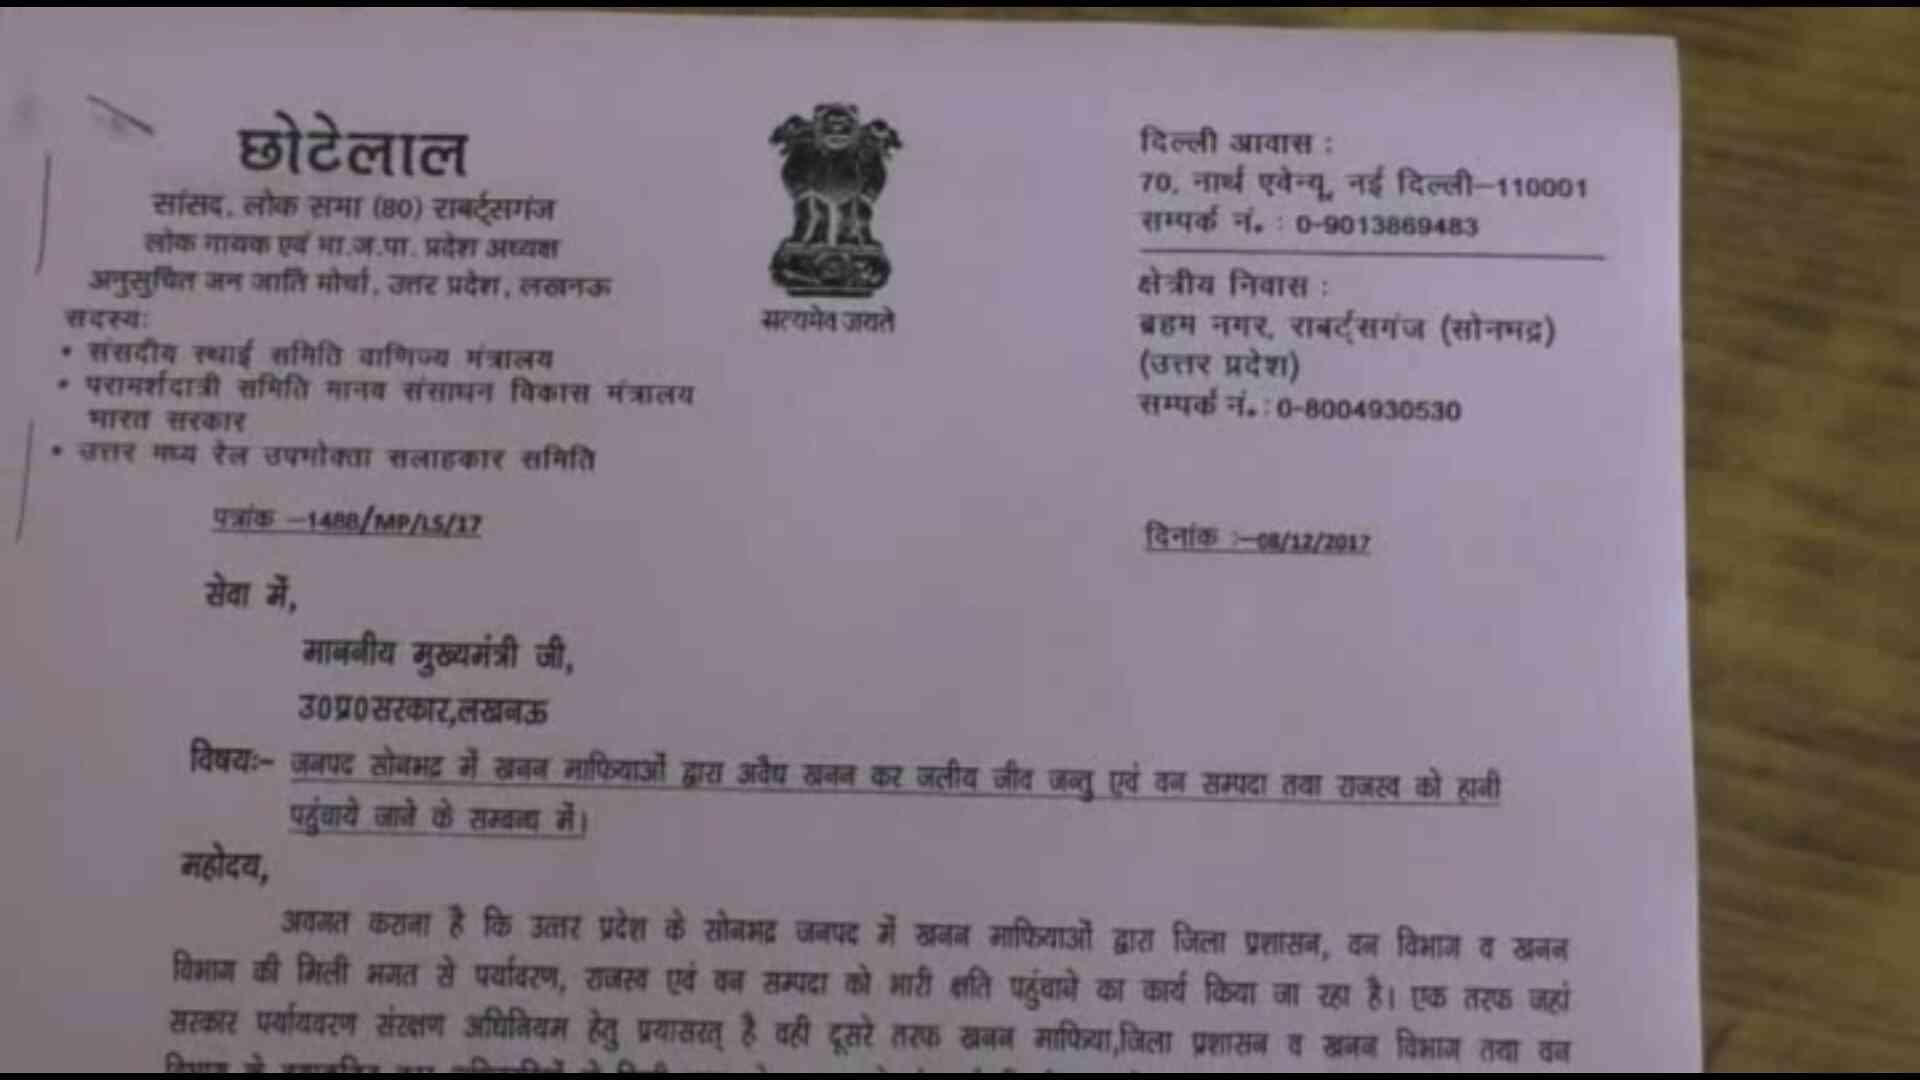 bjp mp Chhote lal kharwar against yogi government for illegal mining